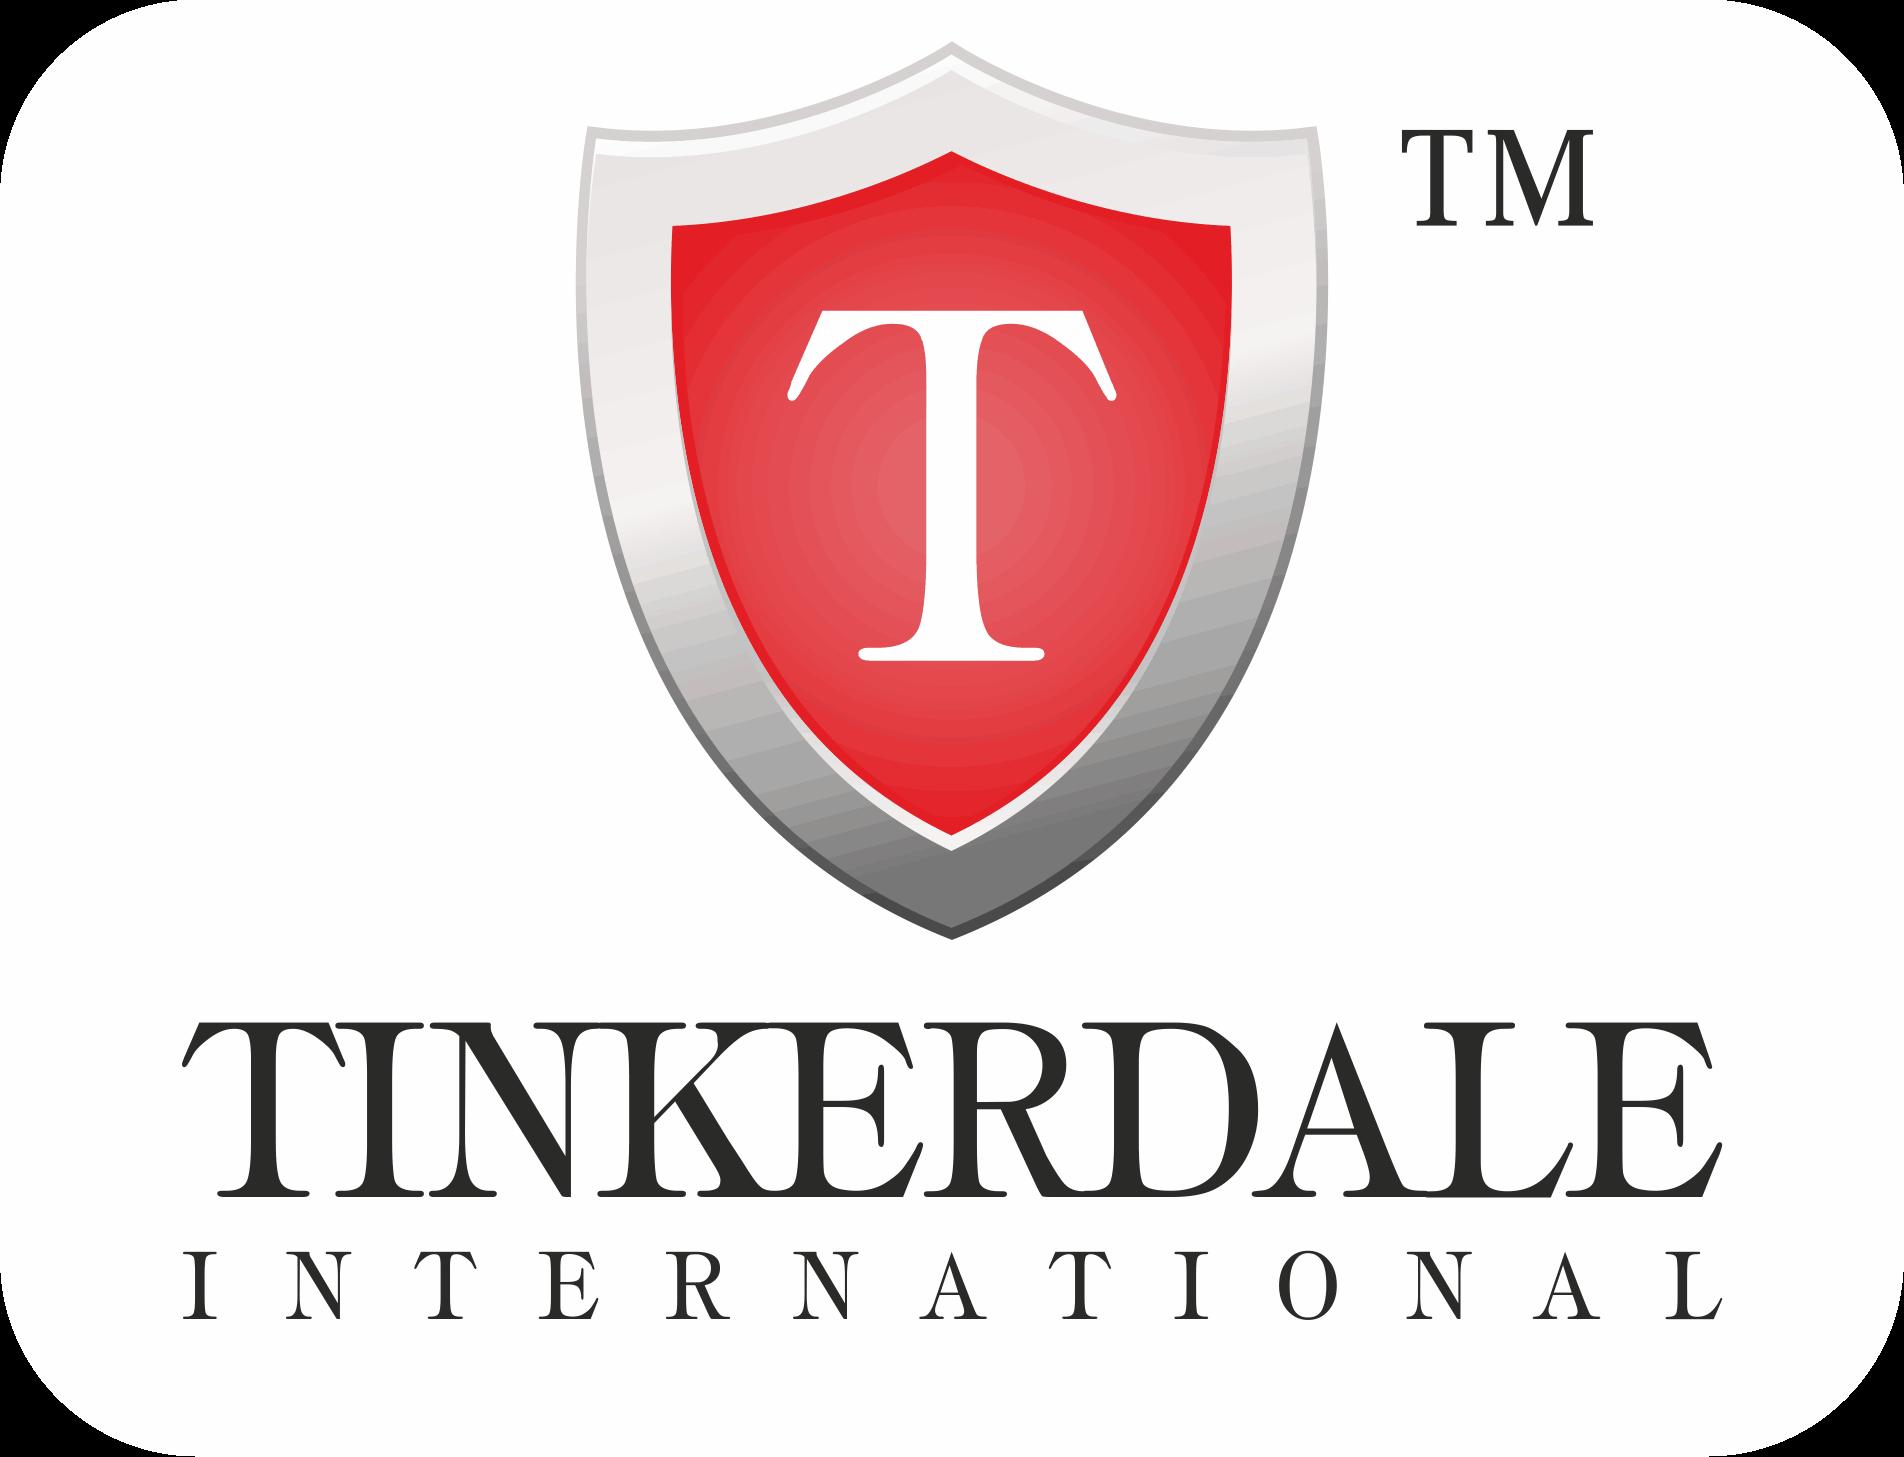 Tinkerdale International, Tinkerdale International